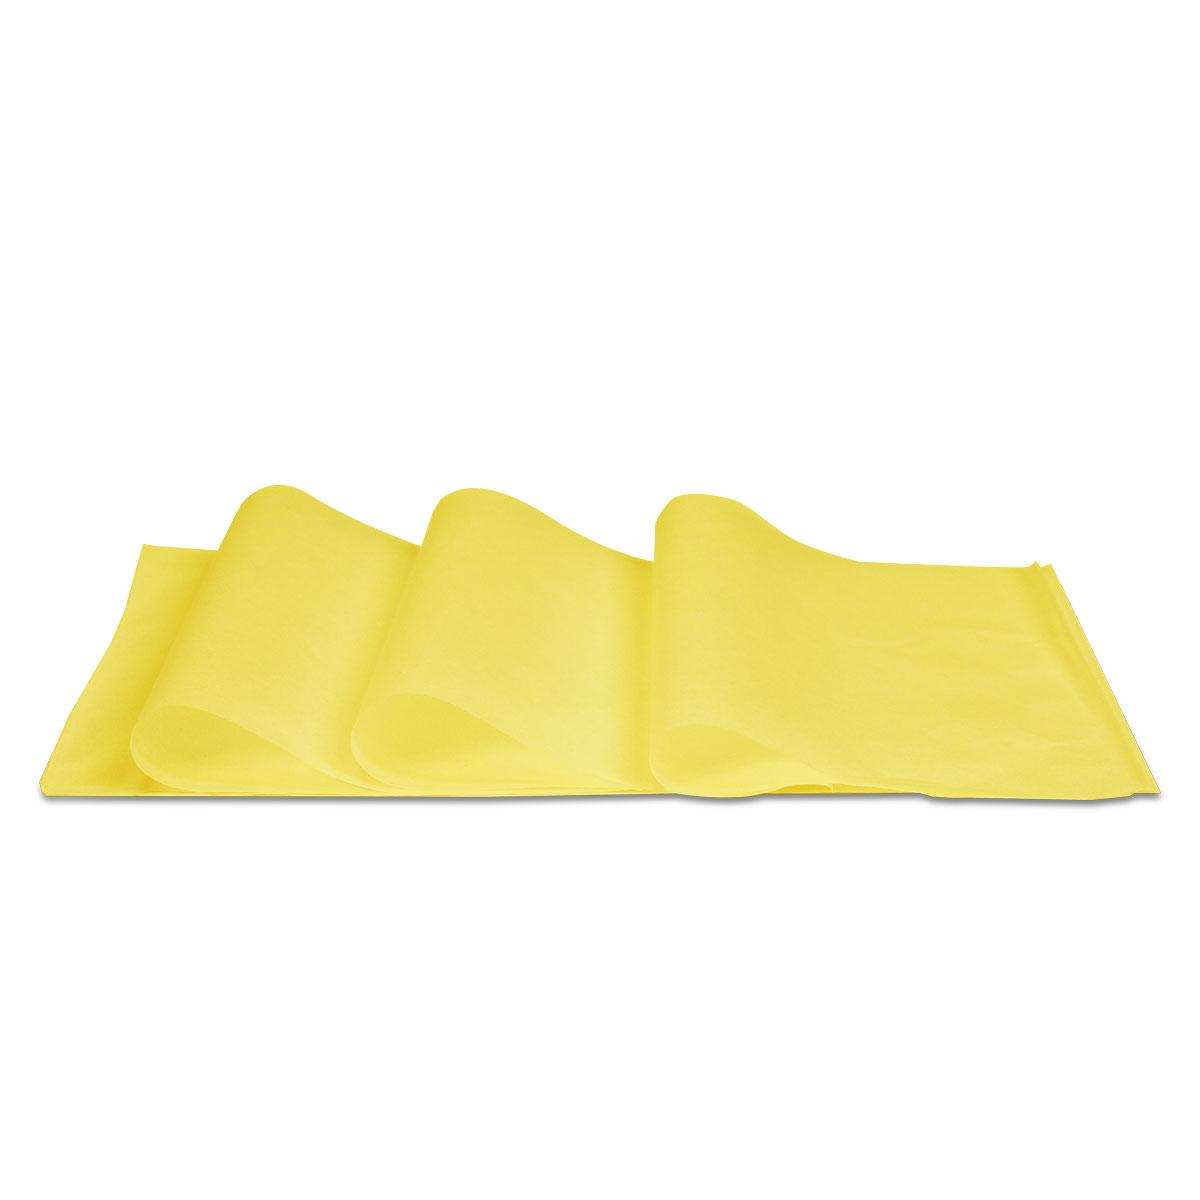 Vloeipapier - Geel